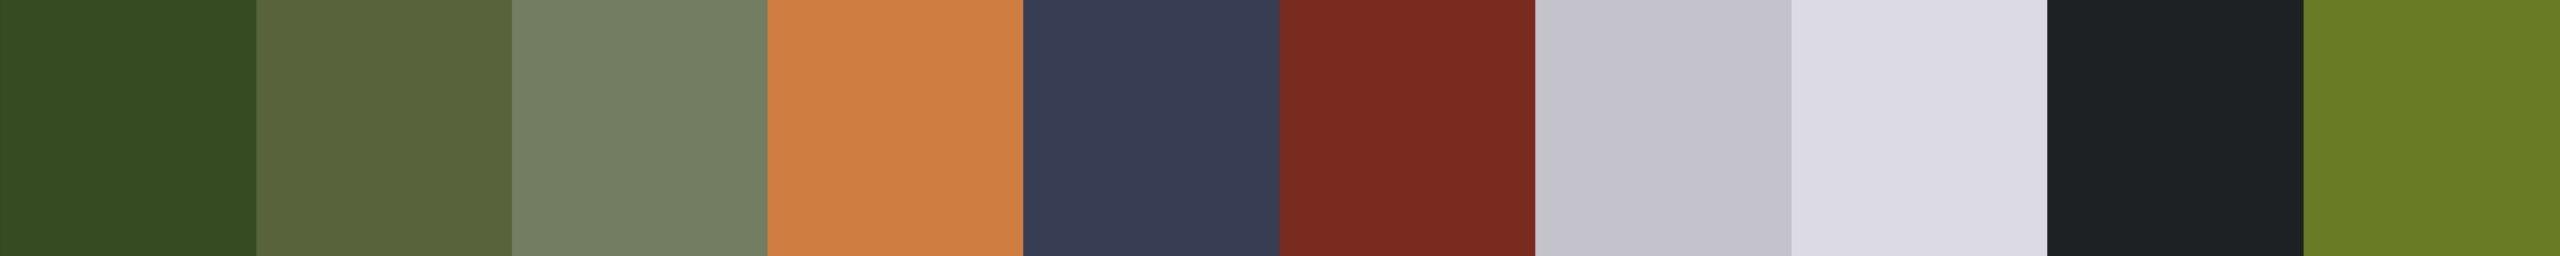 614 Frabika Color Palette